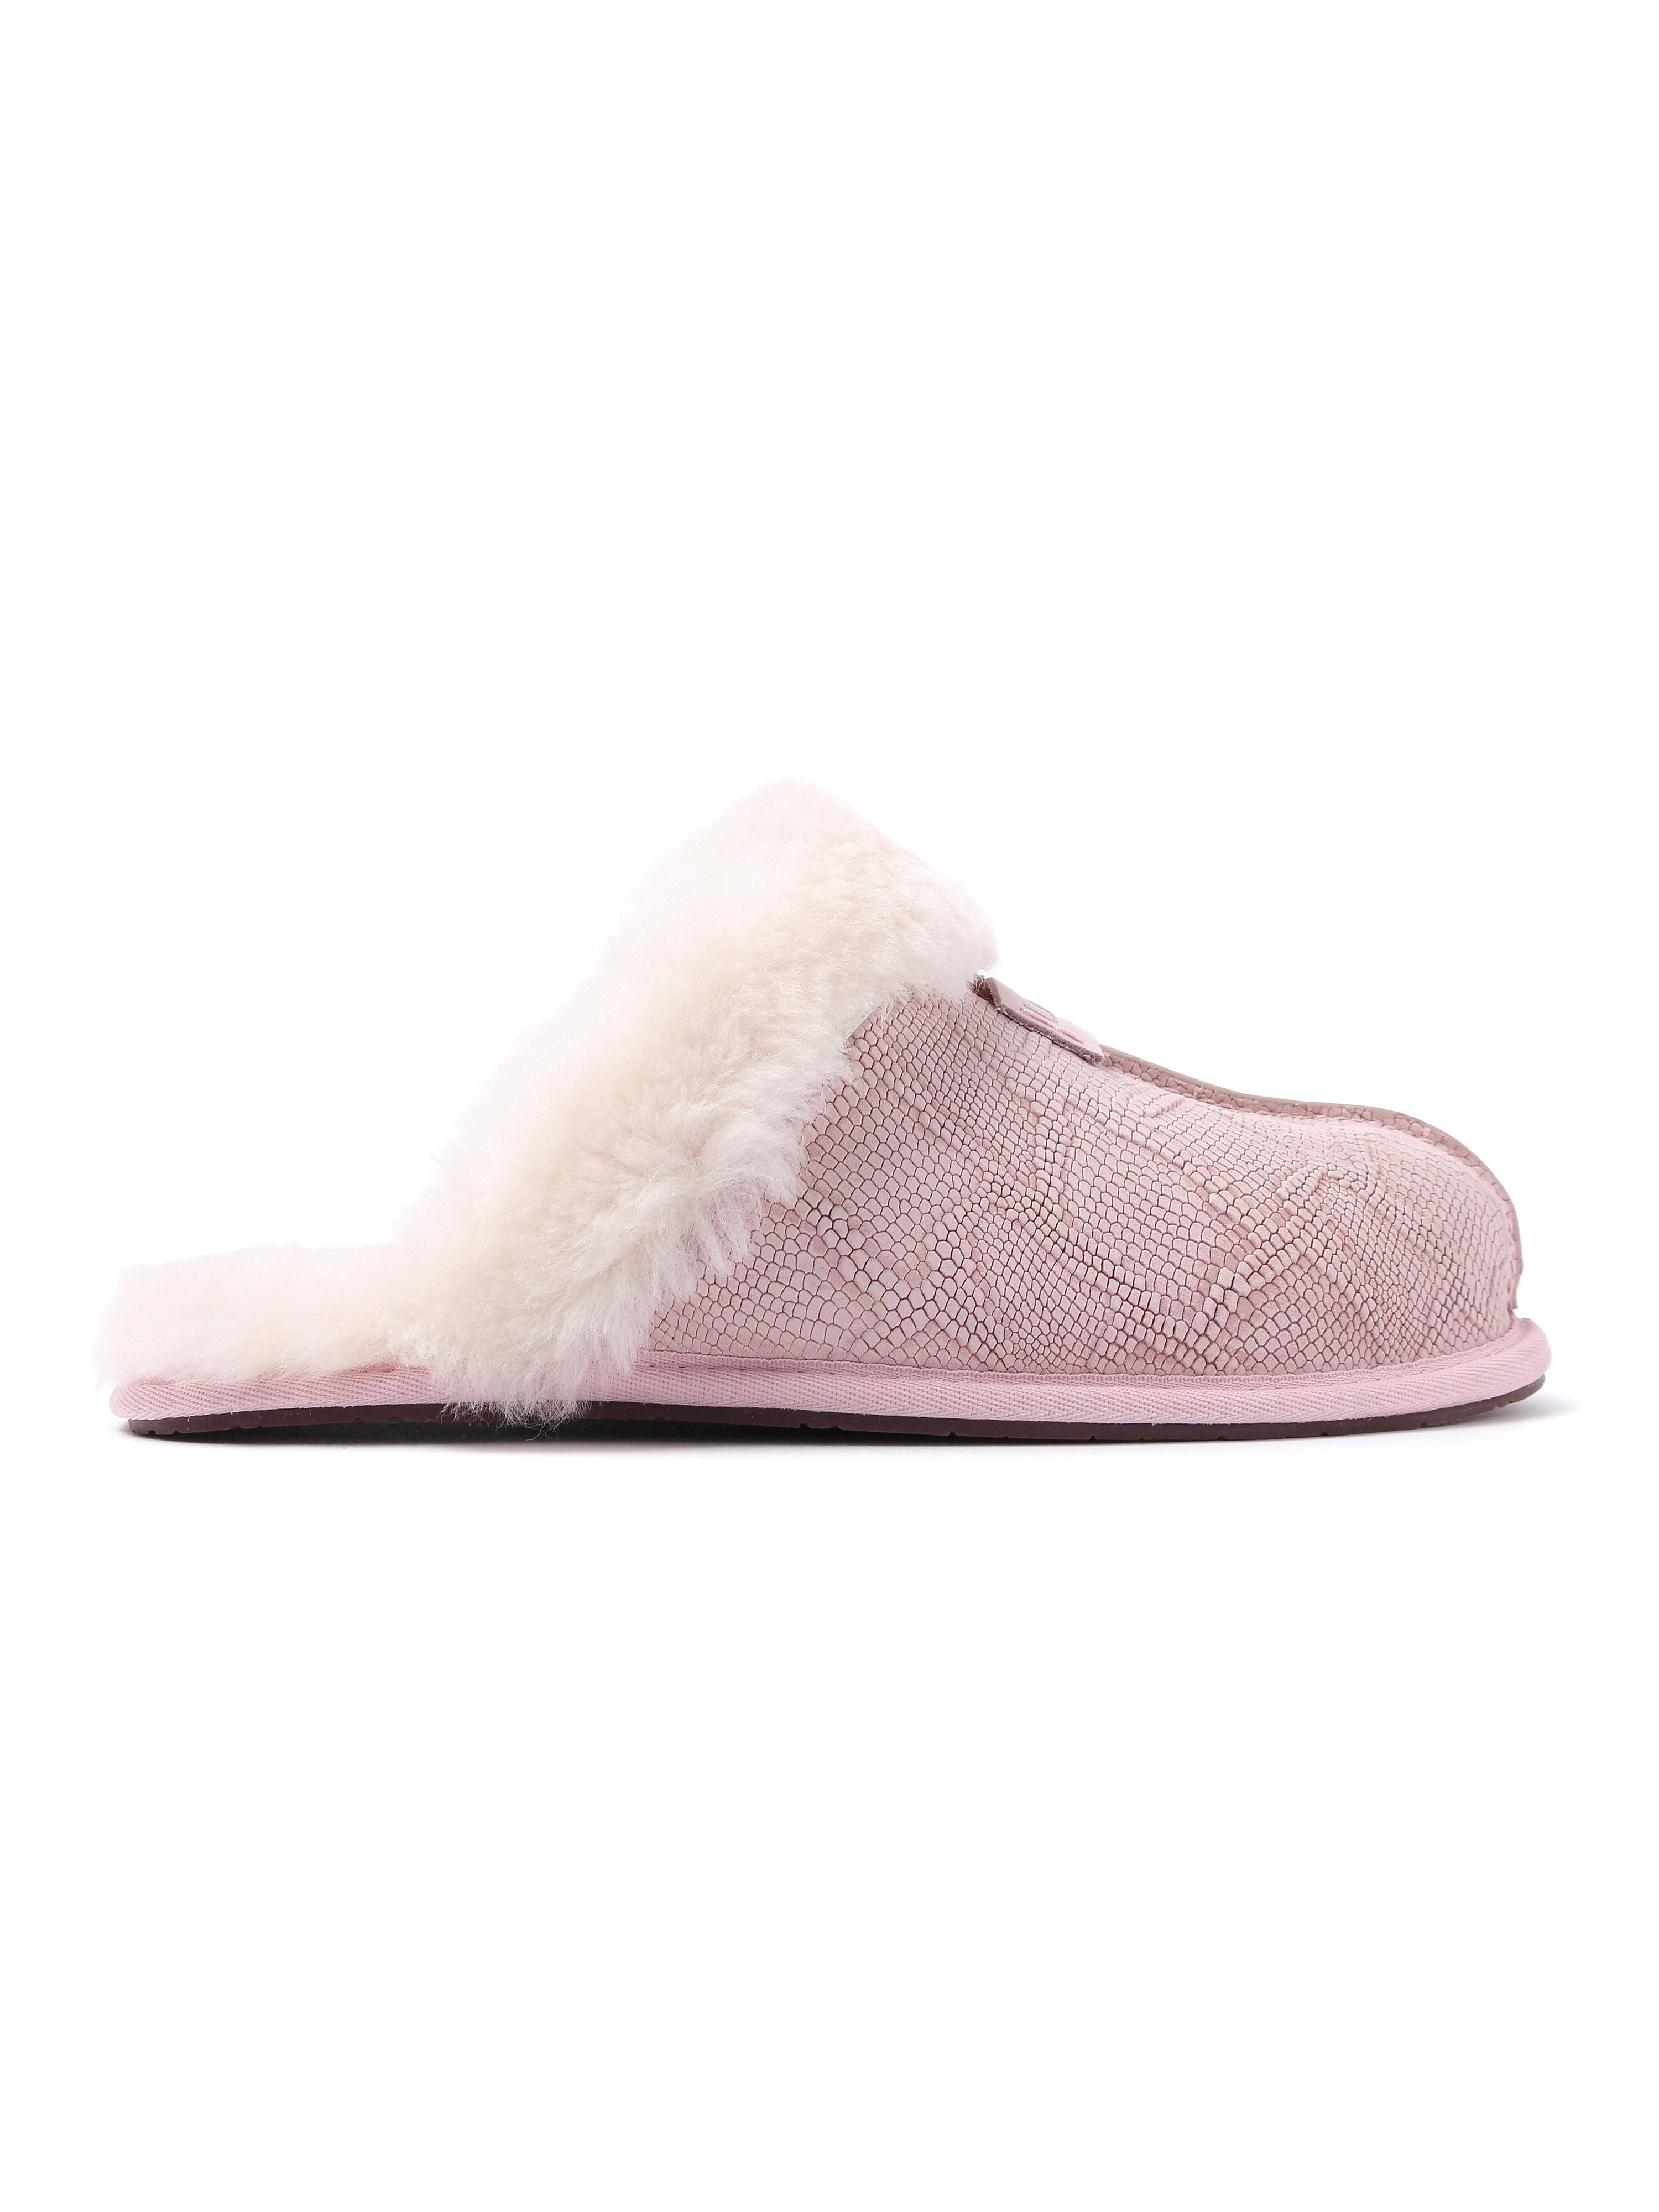 Ugg Women's Scuffette II Snake Sheepskin Slippers - Quartz